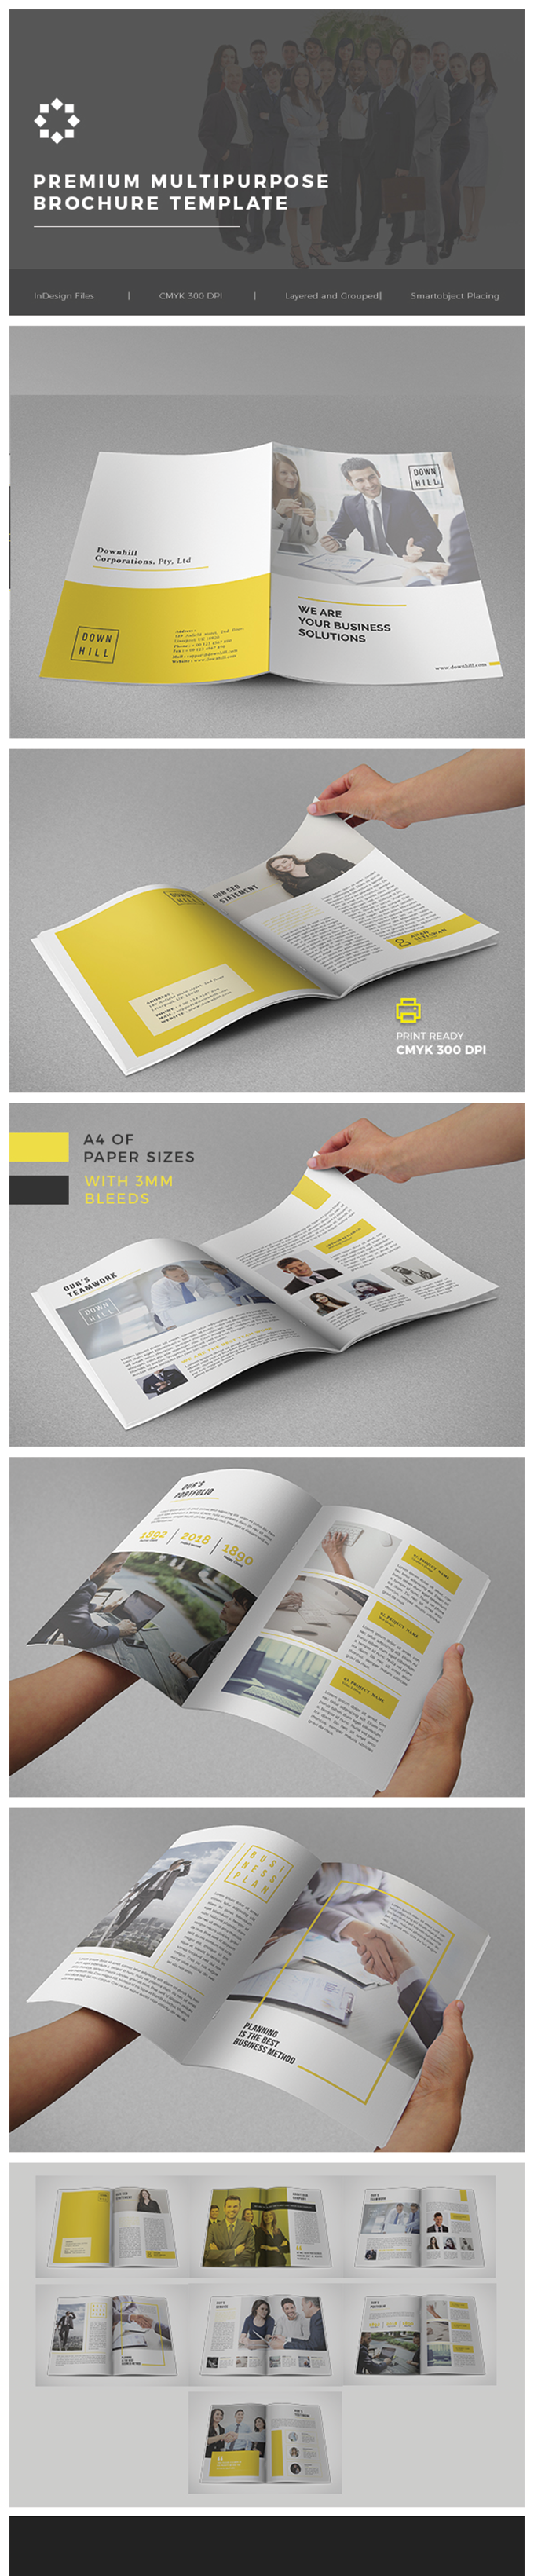 Multipurpose Business Brochure Template Vol. 02